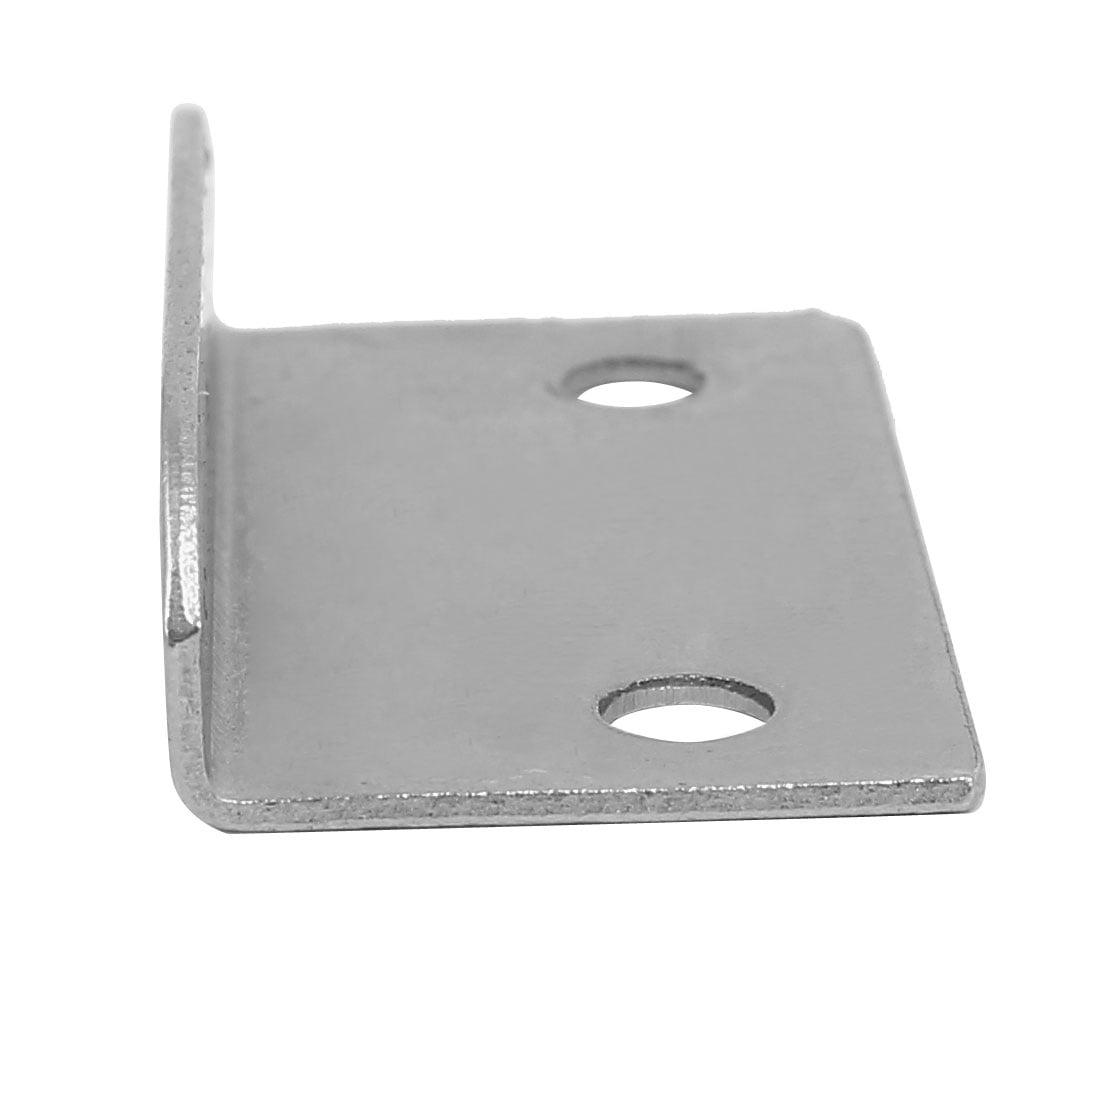 Home Office Cabinet Drawer Metal Lock Strike Plates 39mm Length 30PCS - image 1 de 3